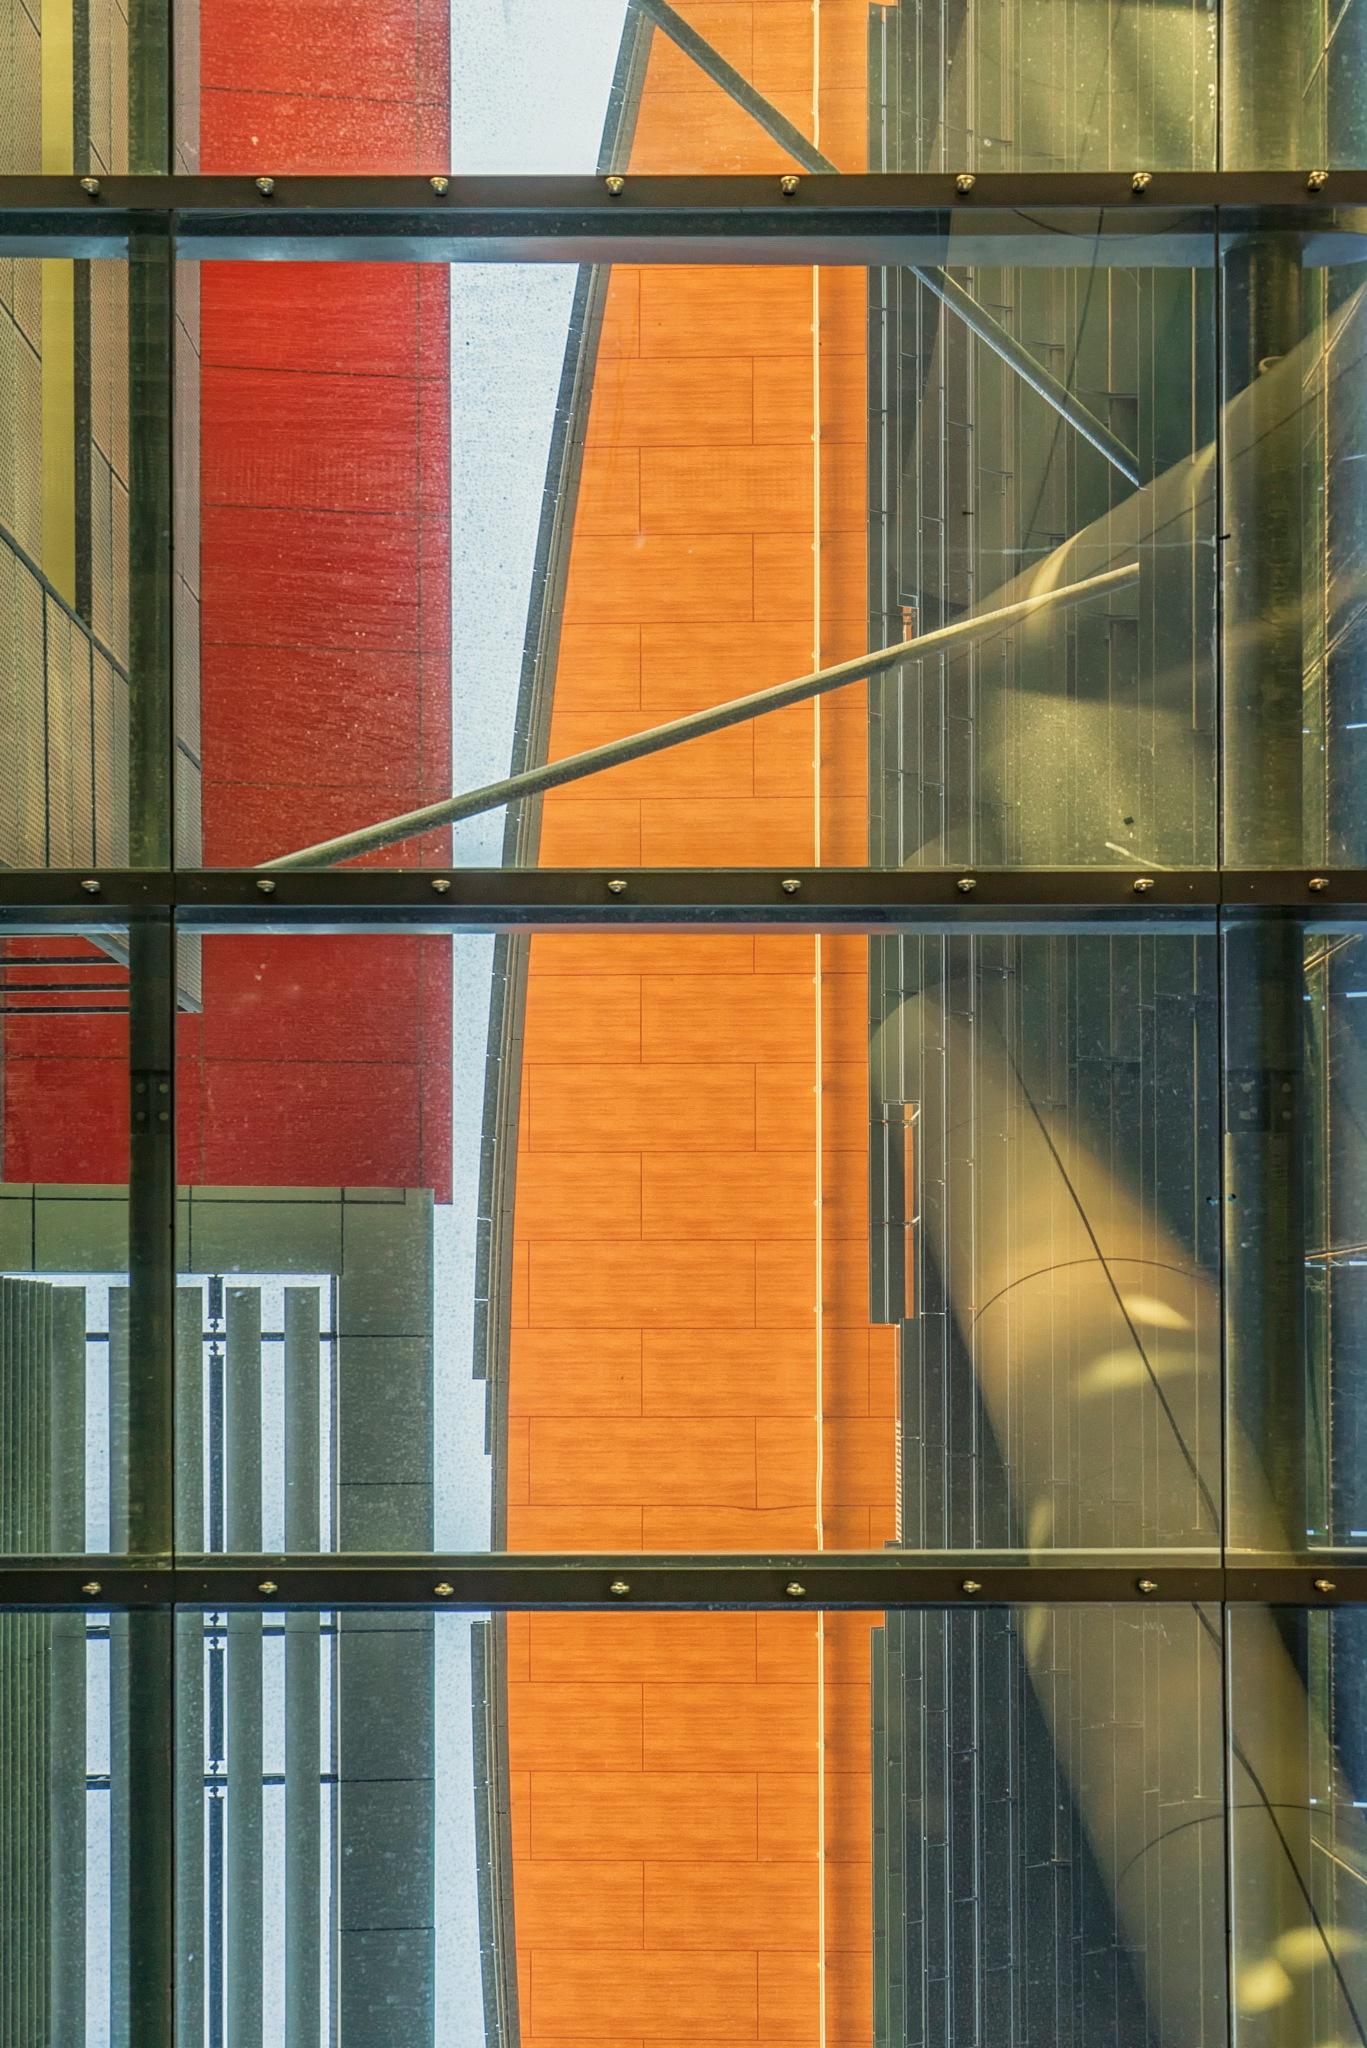 Red and Orange, high up. by ensbassatt